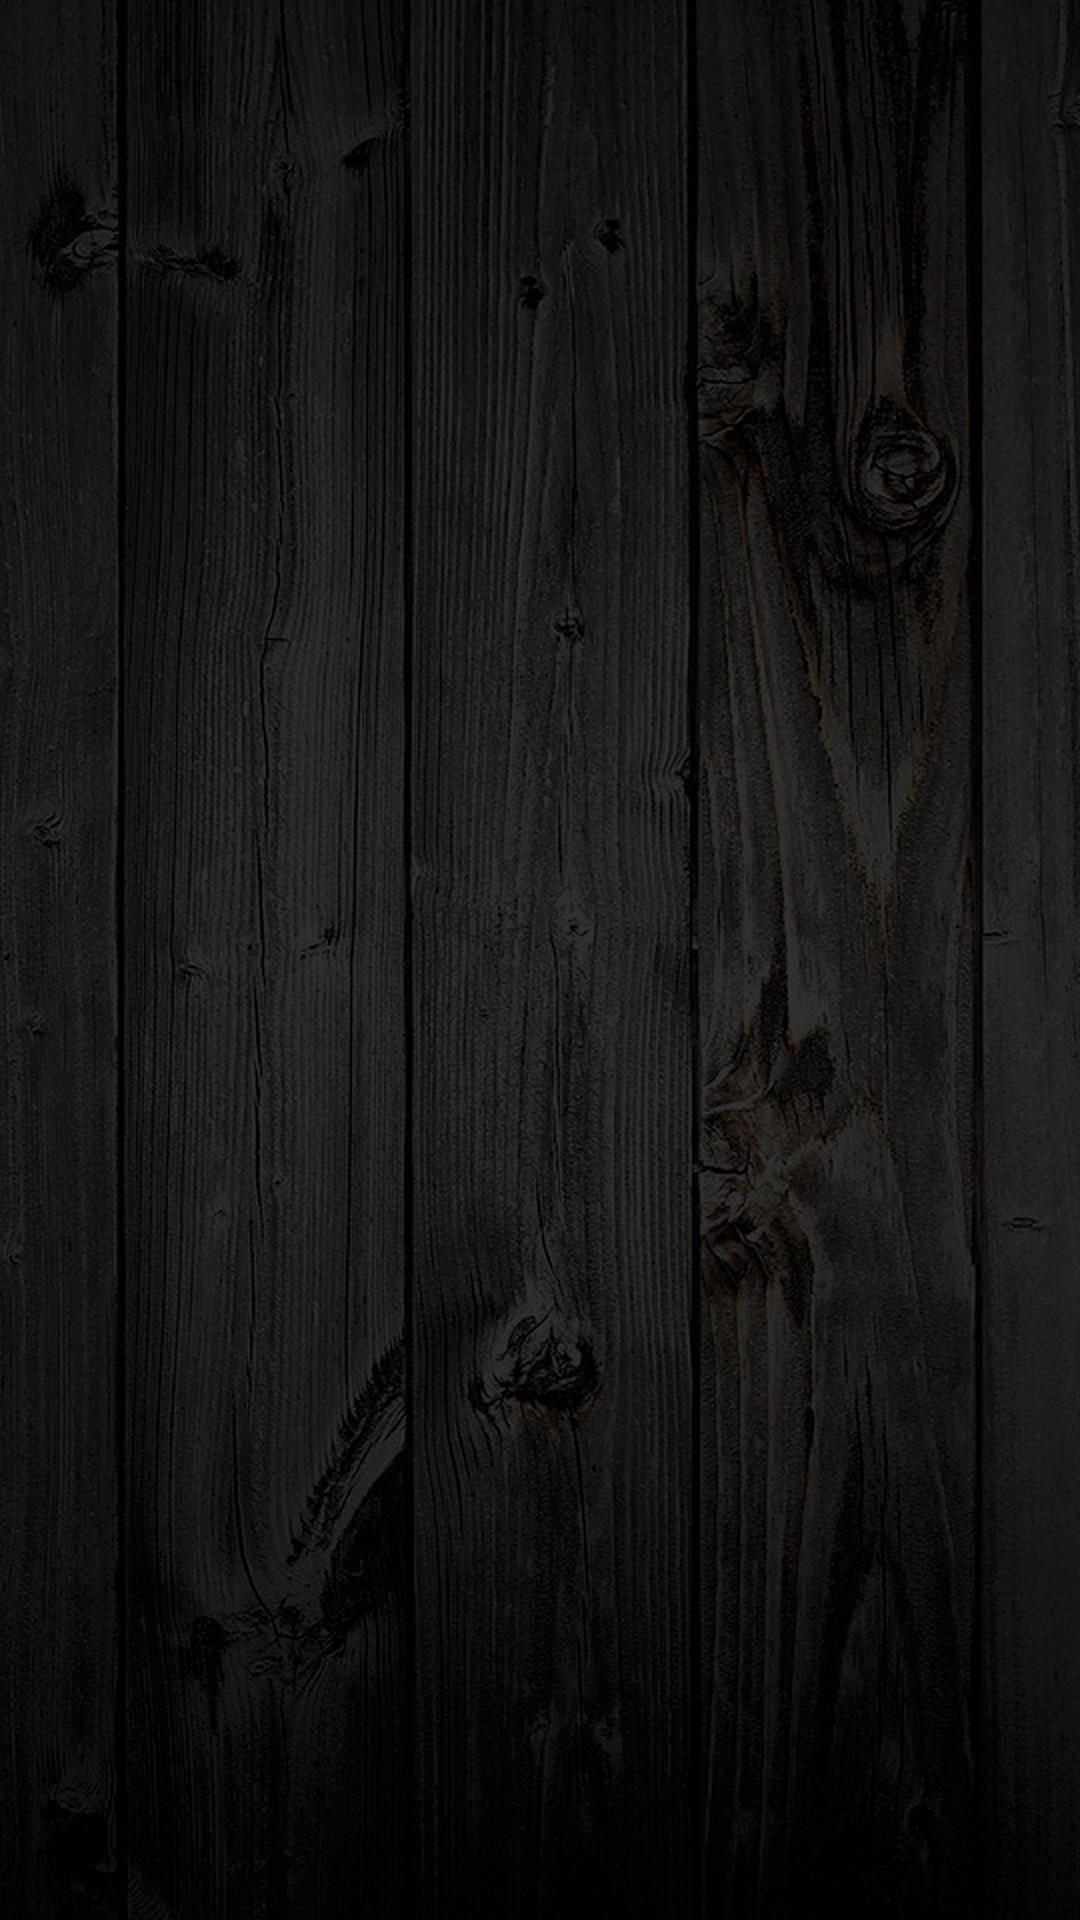 Phone Wallpapers Black